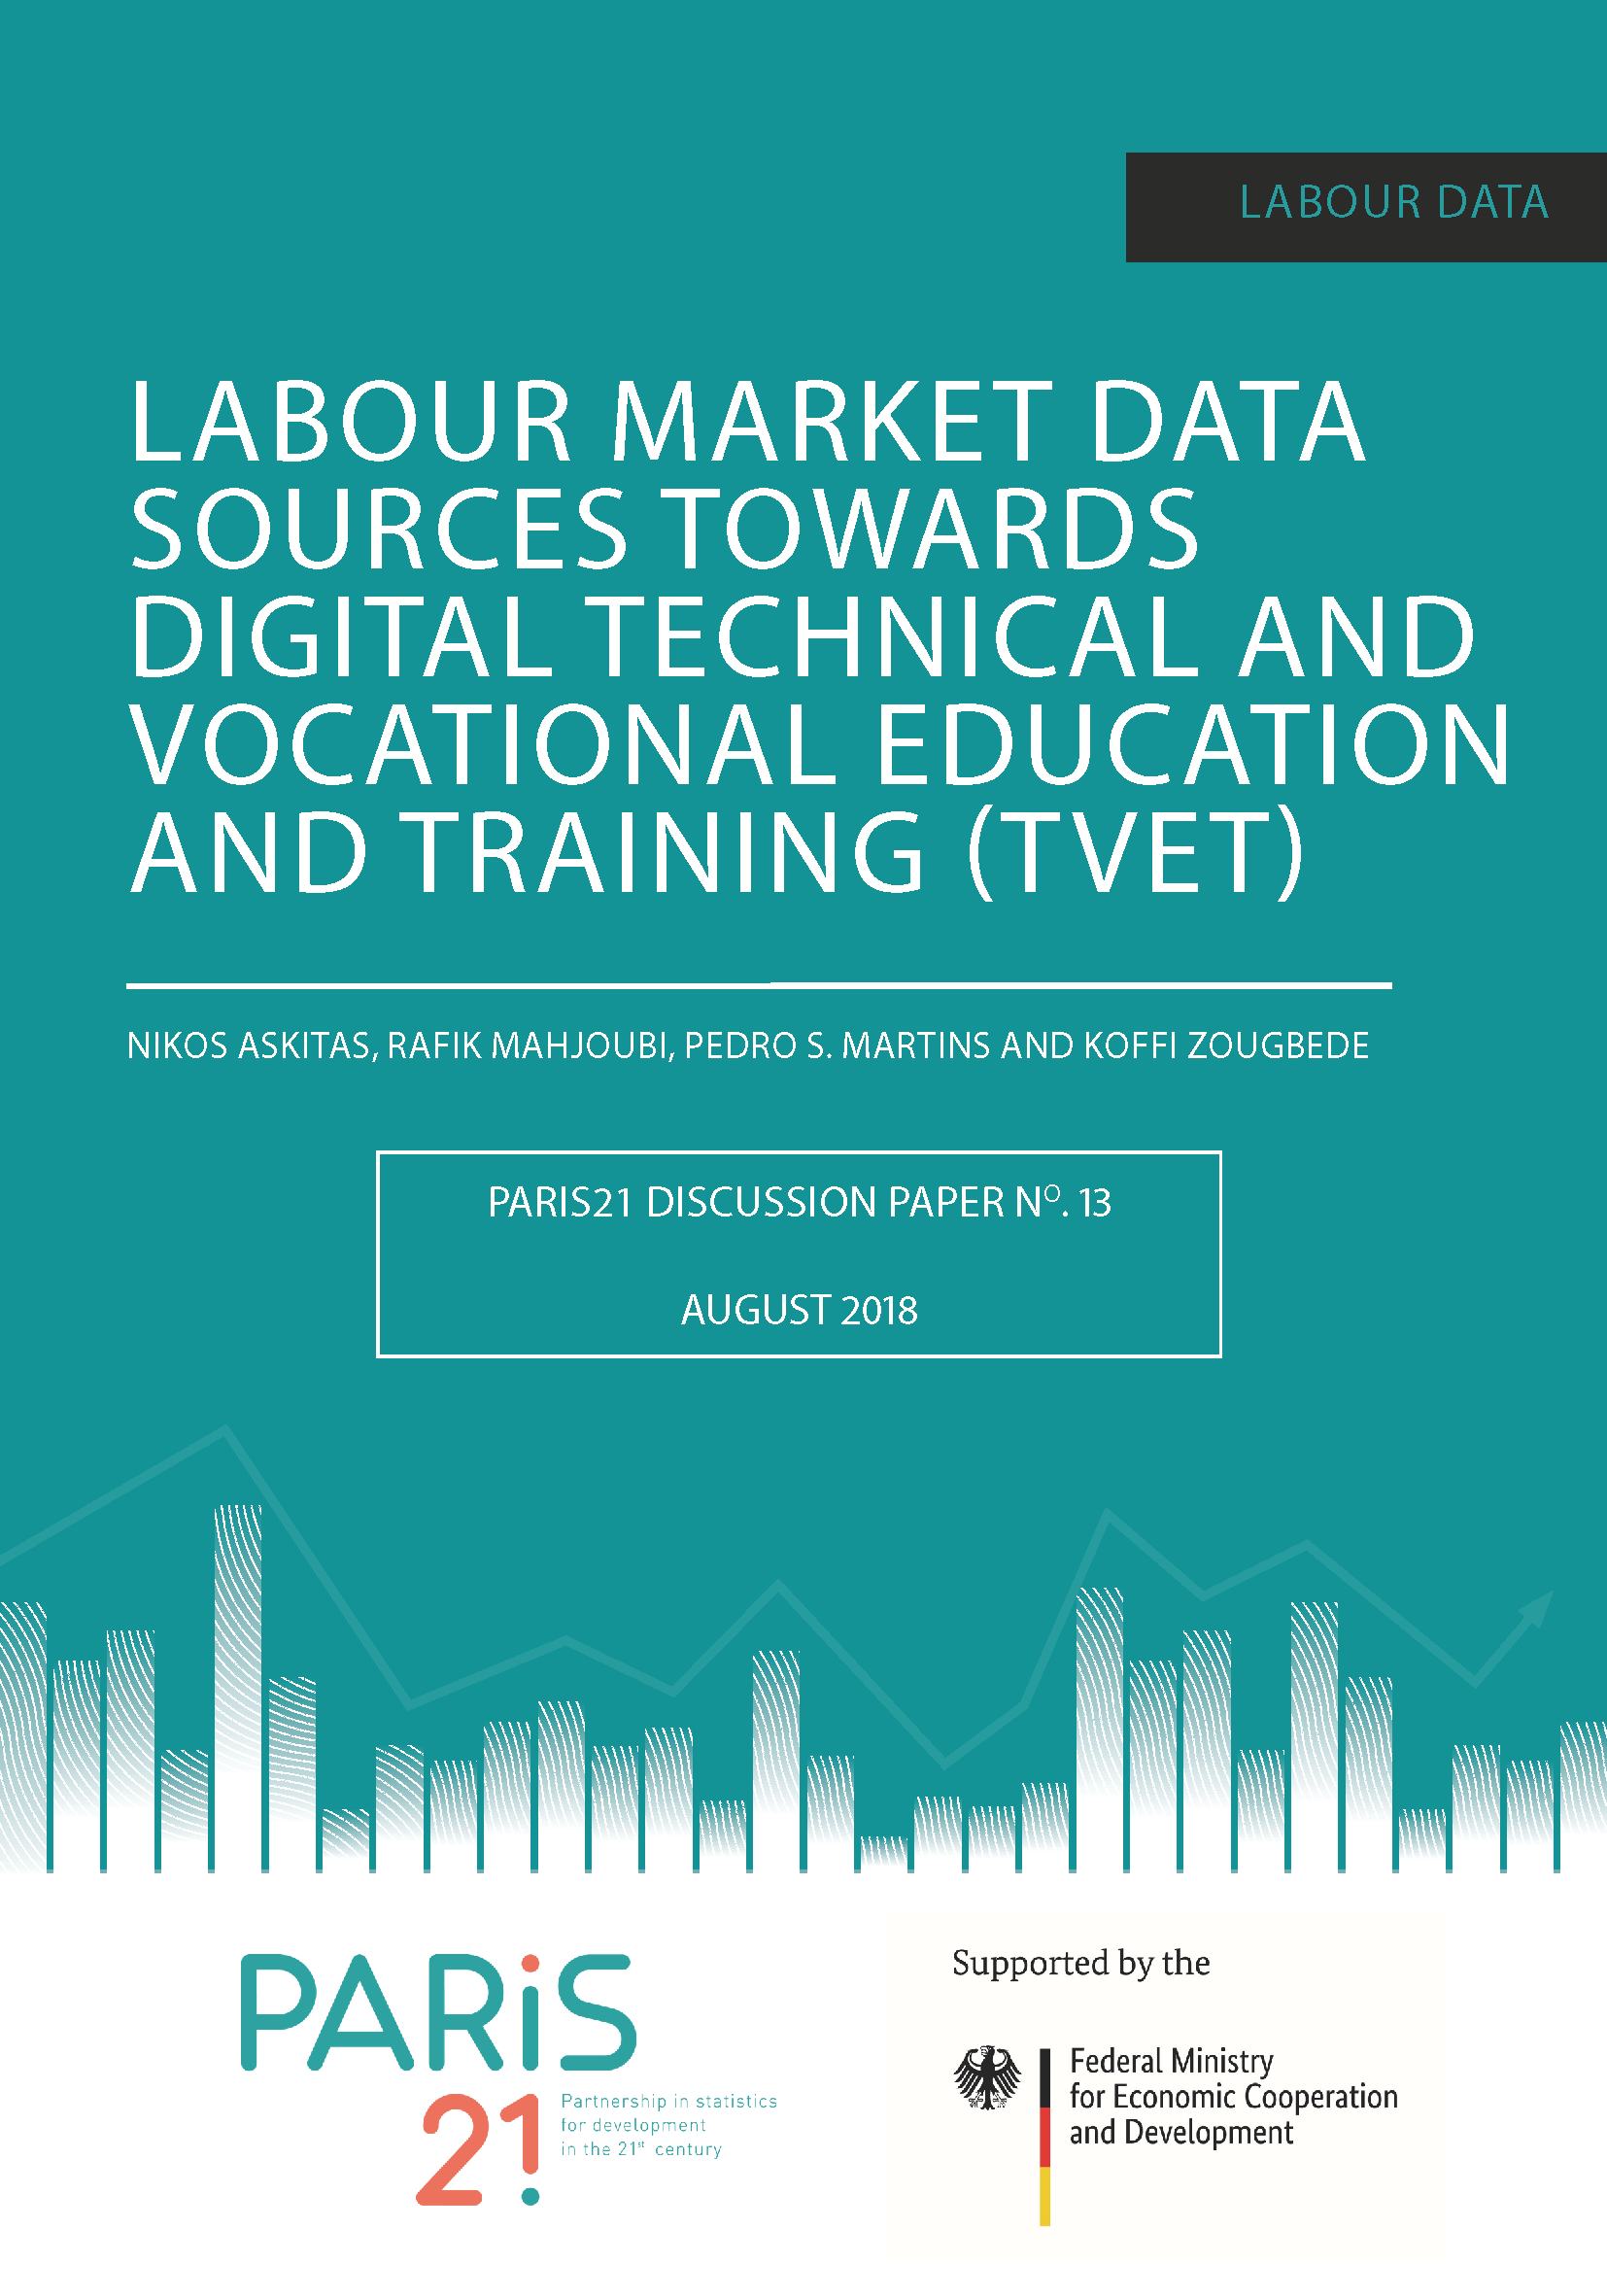 LABOUR MARKET DATA SOURCES TOWARDS DIGITAL TECHNICAL AND VOCATIONAL